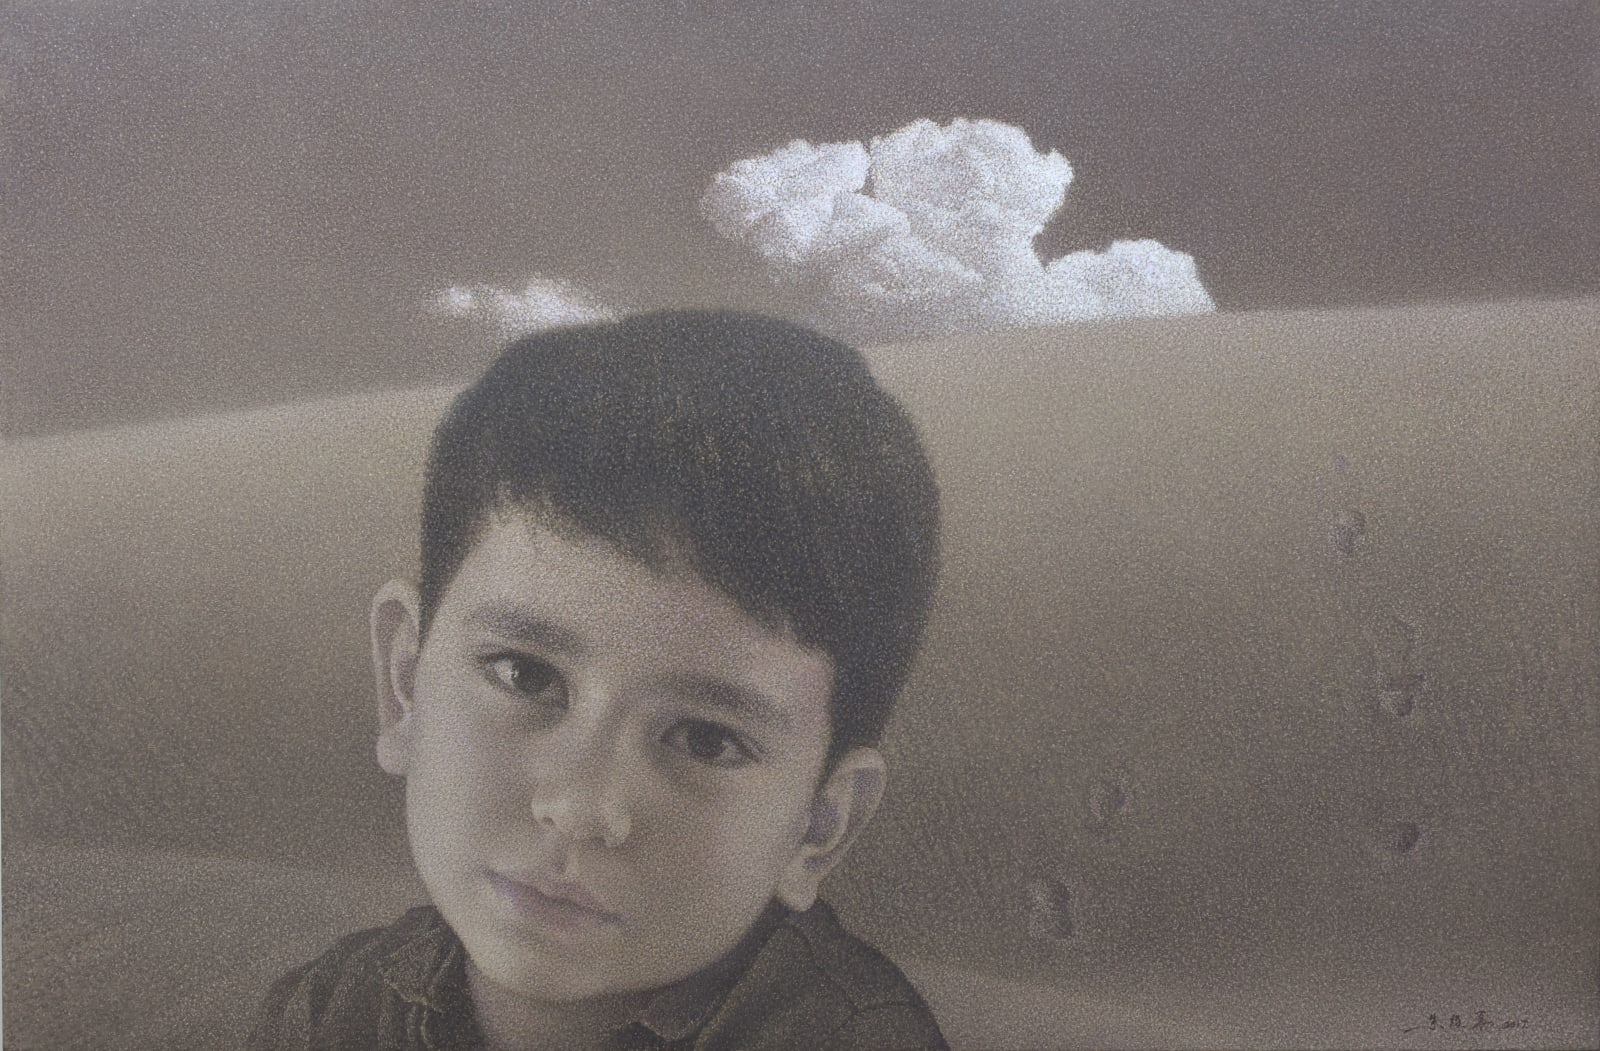 Zhu Yiyong 朱毅勇, The Realm of the Heart - Ryan 心境之Ryan , 2017